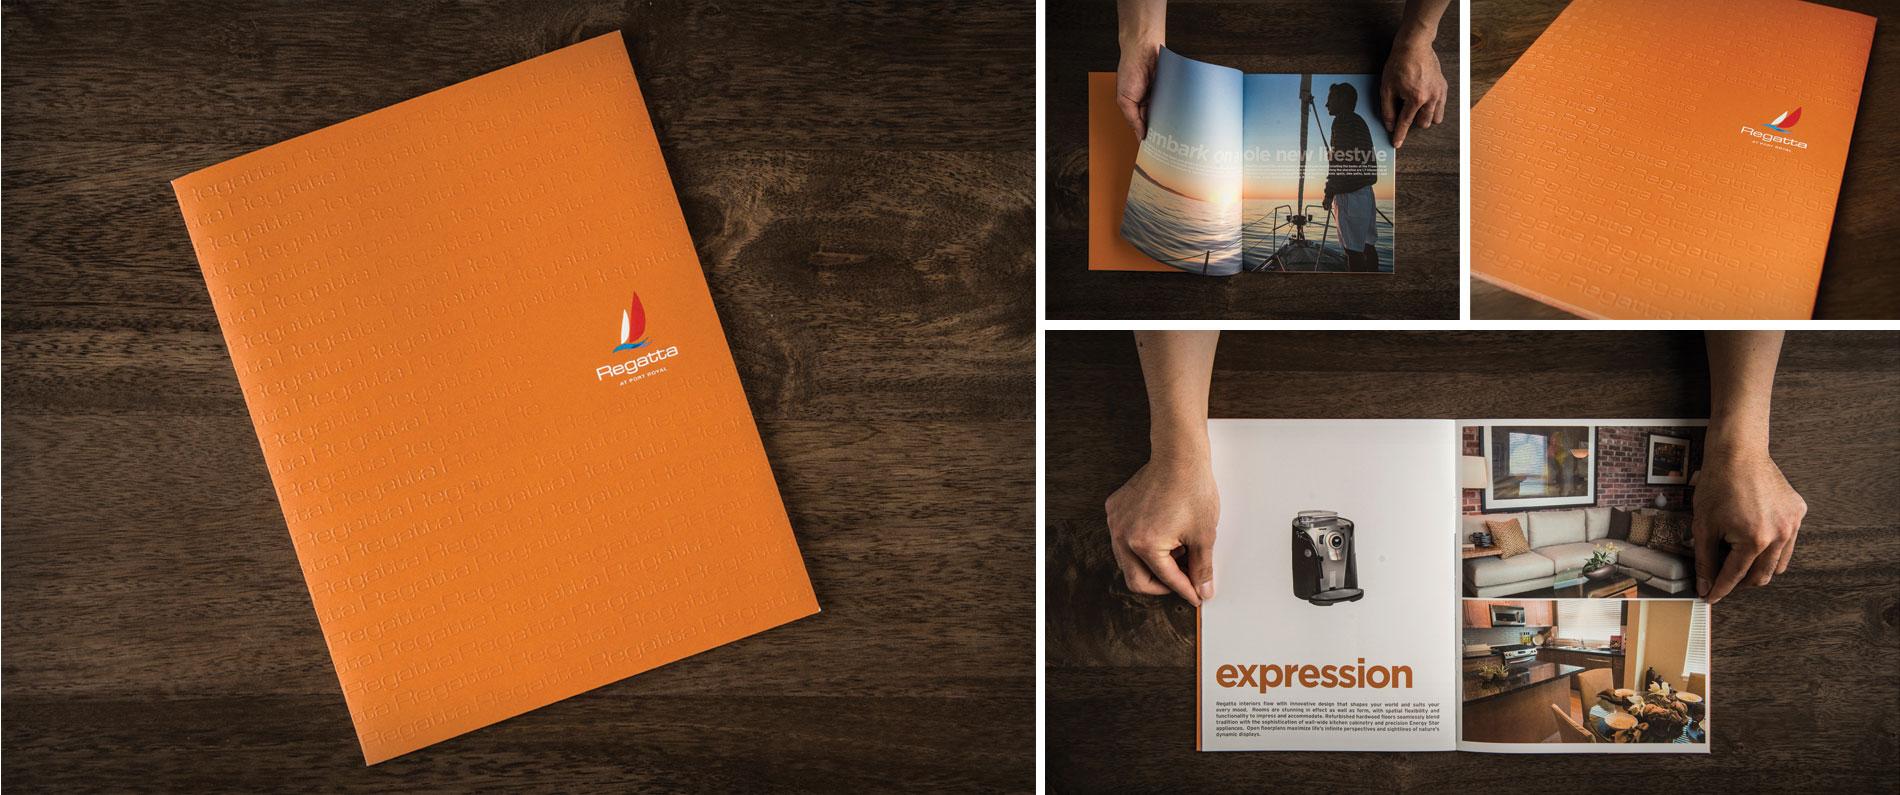 Custom printed and embossed booklet for Regatta